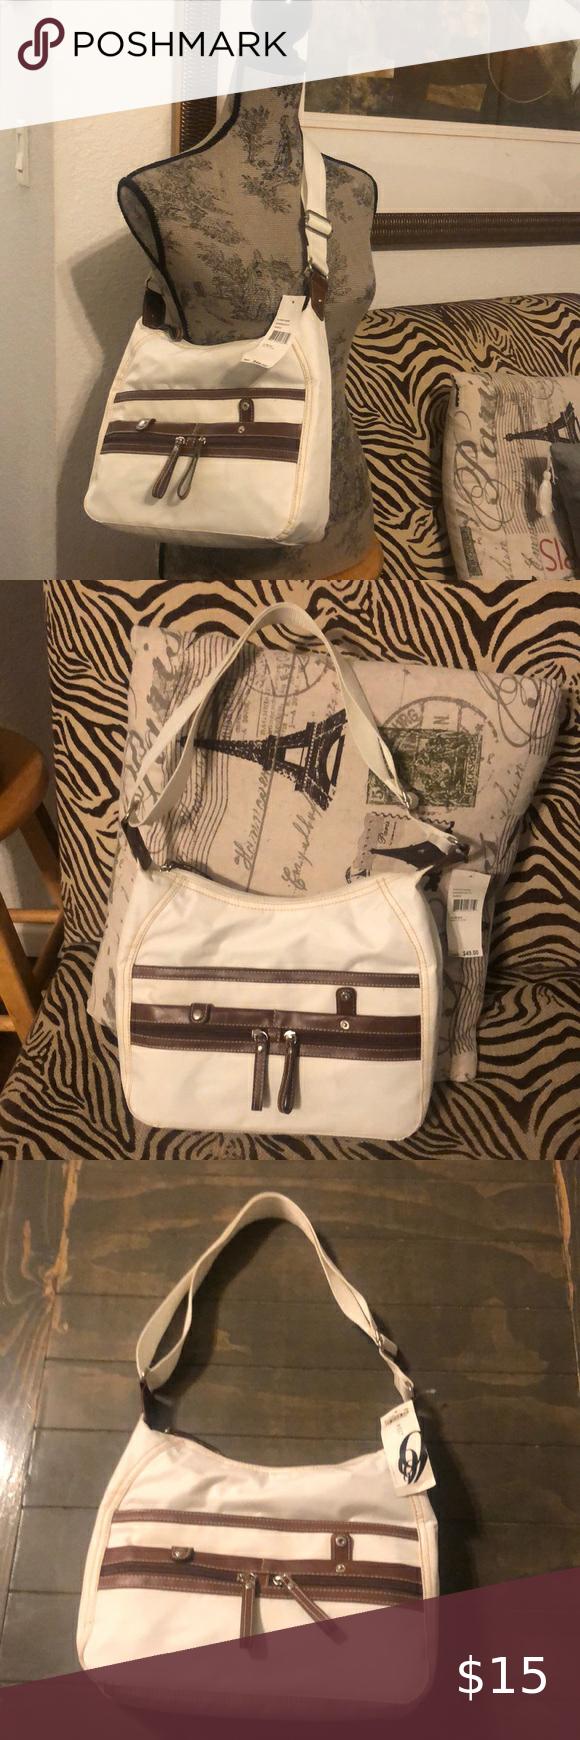 Nine West Bag Bags Crossbody Bag Nine West